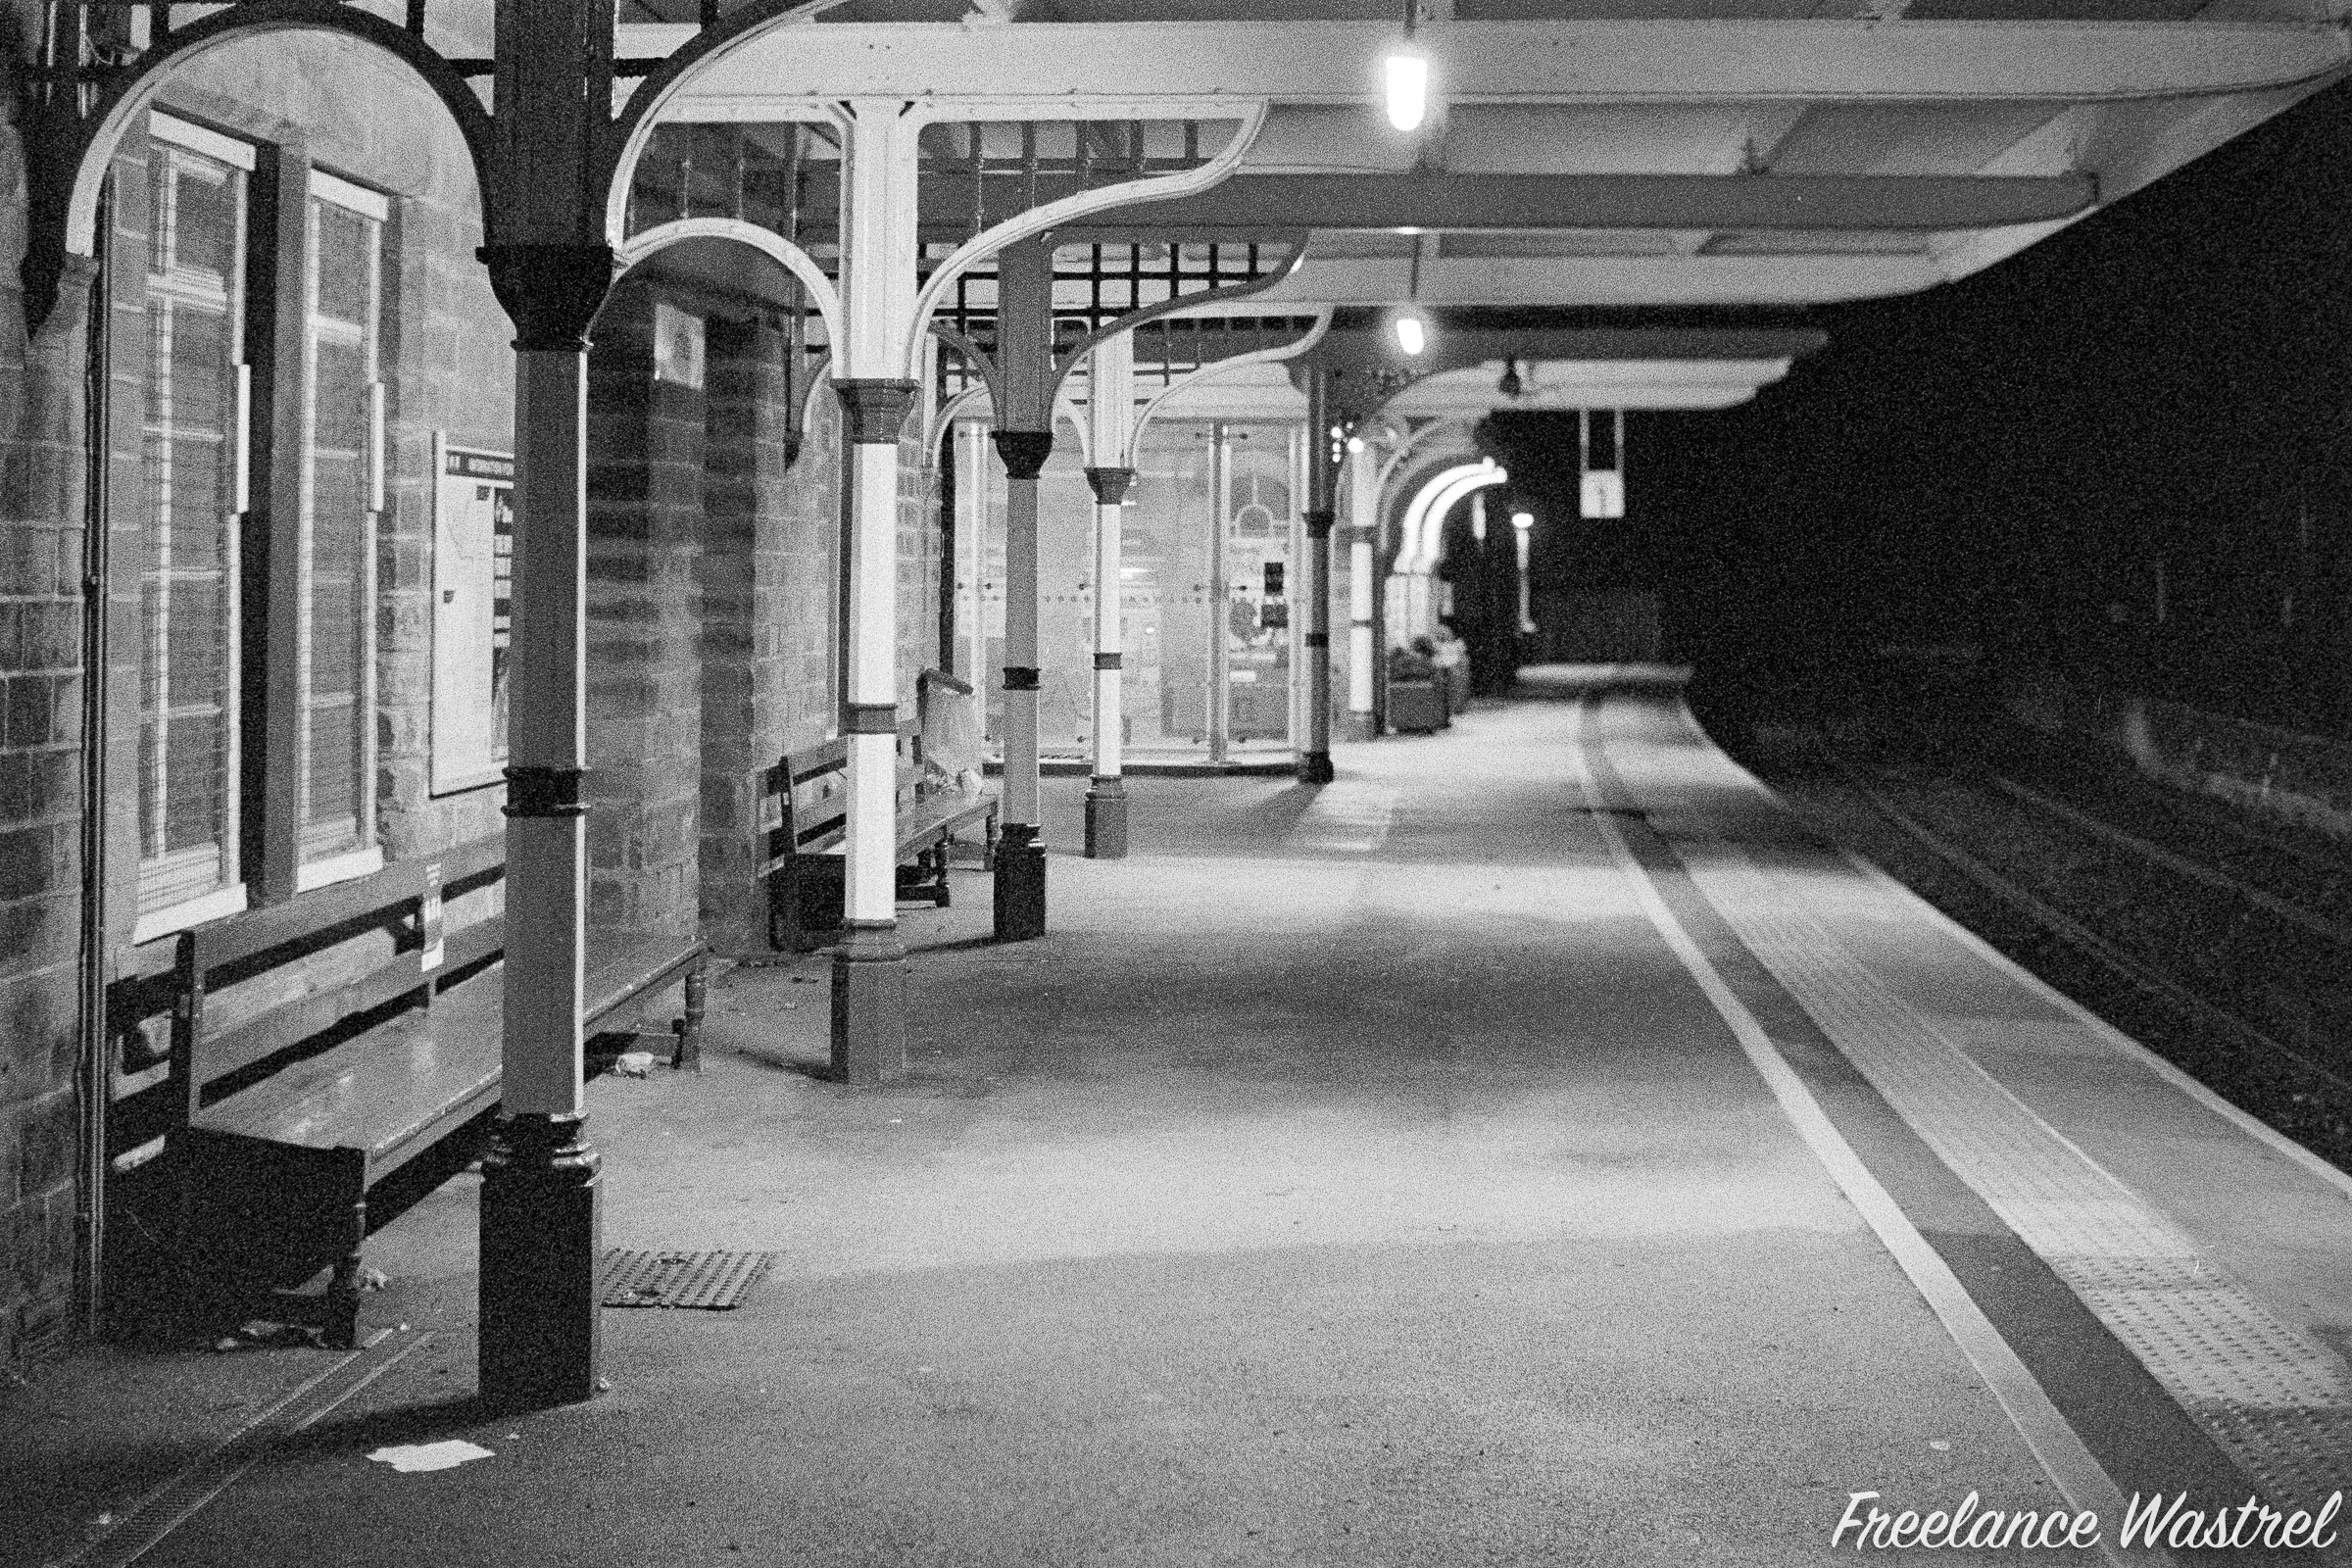 Waiting for the last train, November 2020